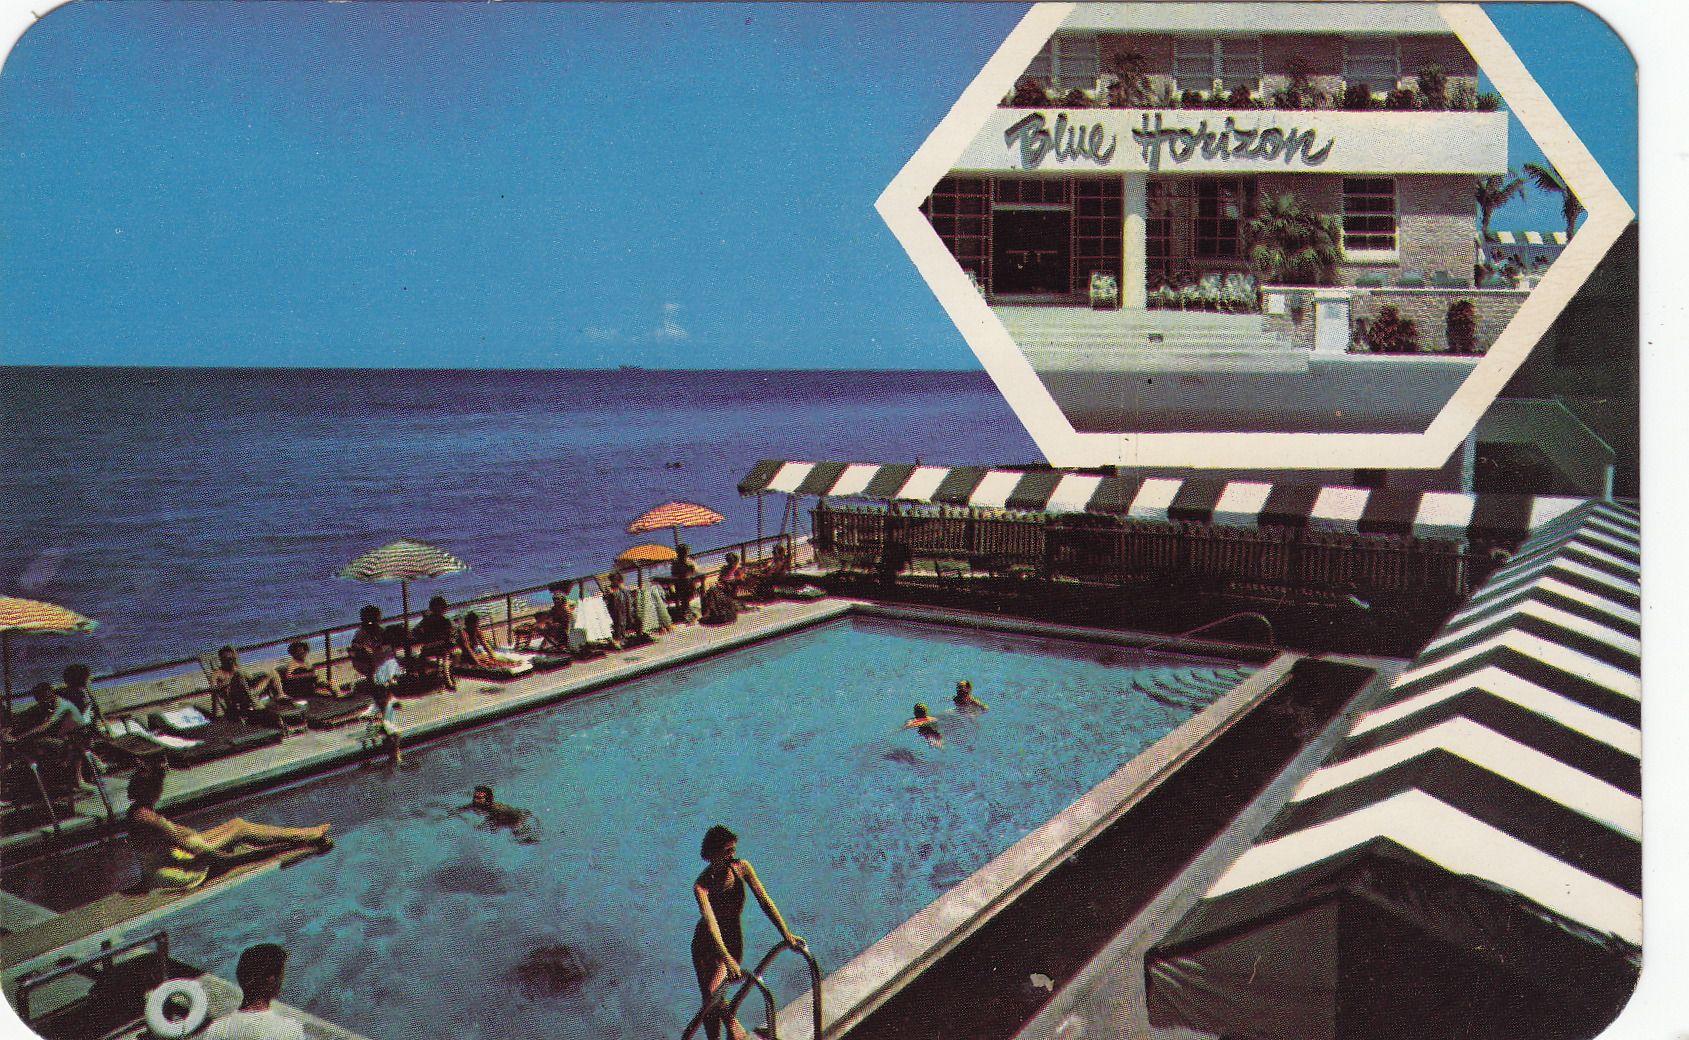 Blue horizon hotel miami beach fl vintage postcards